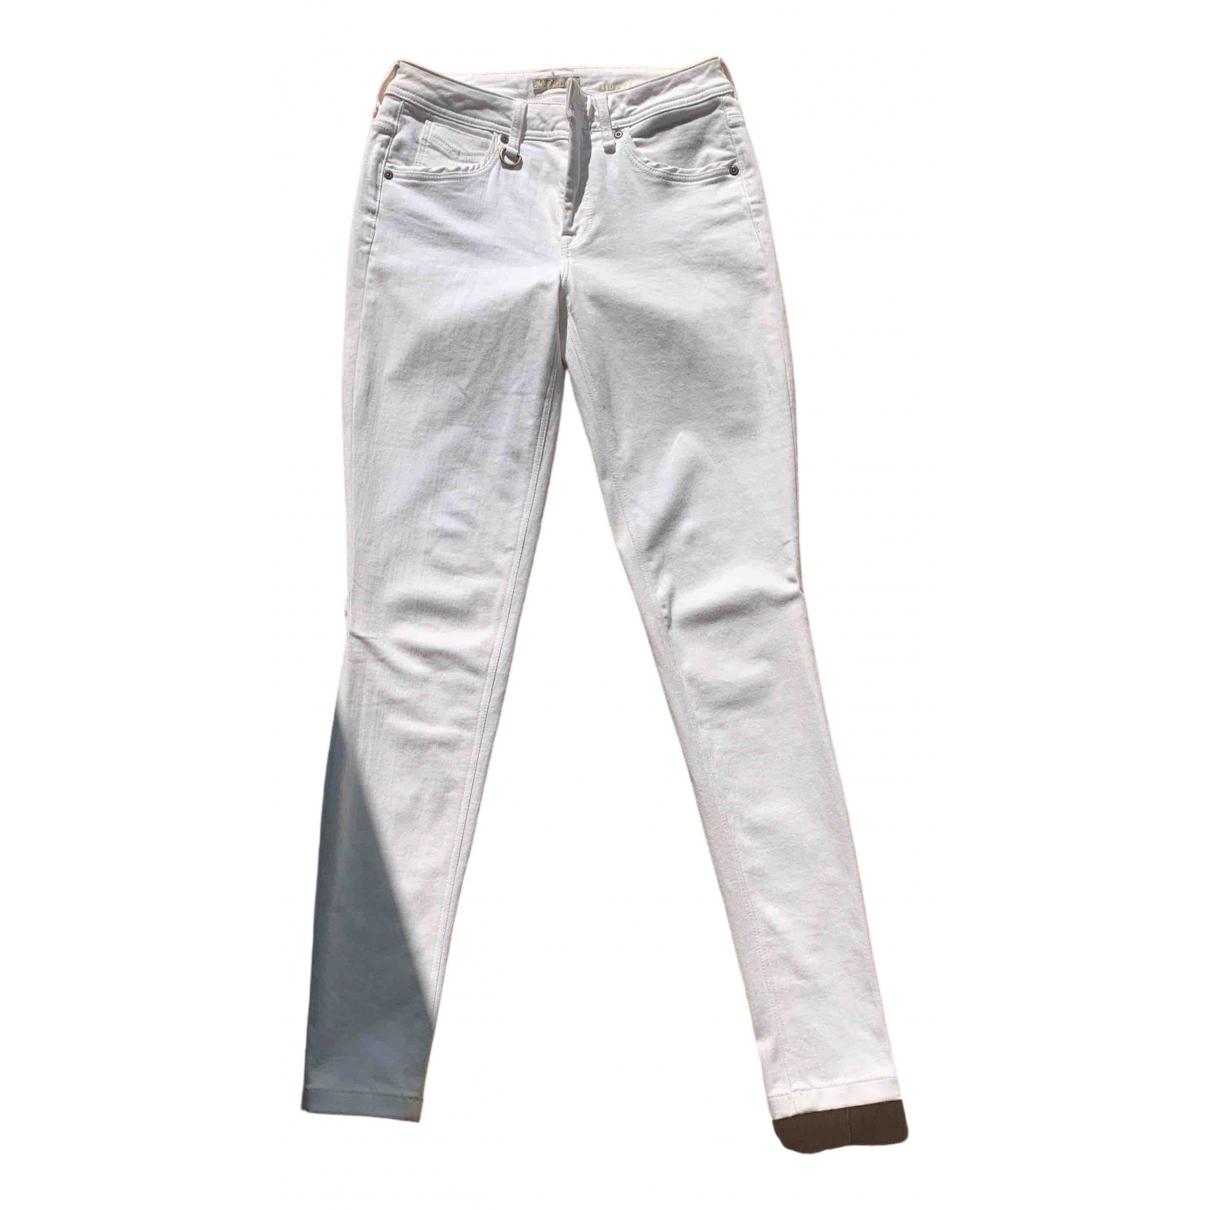 Burberry N White Cotton - elasthane Jeans for Women 28 US